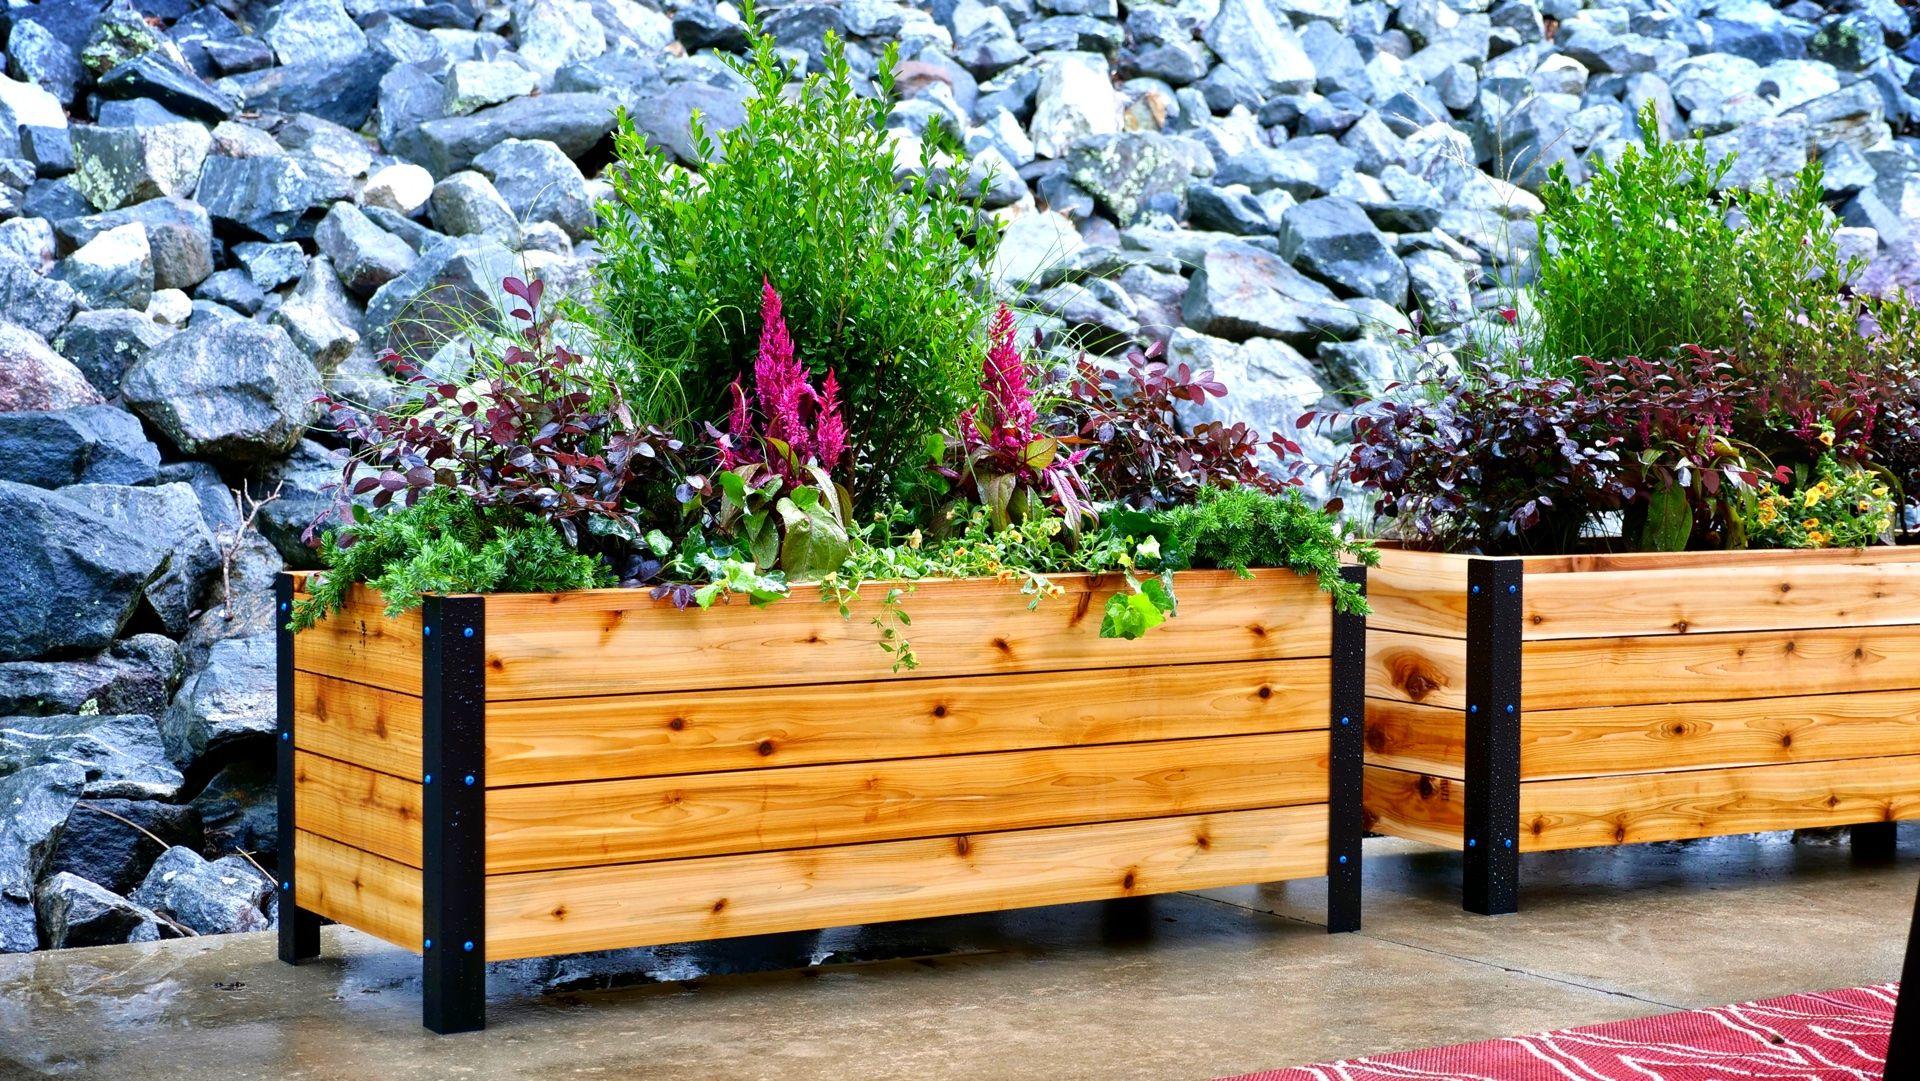 How To Build A DIY Modern Raised Planter Box Raised